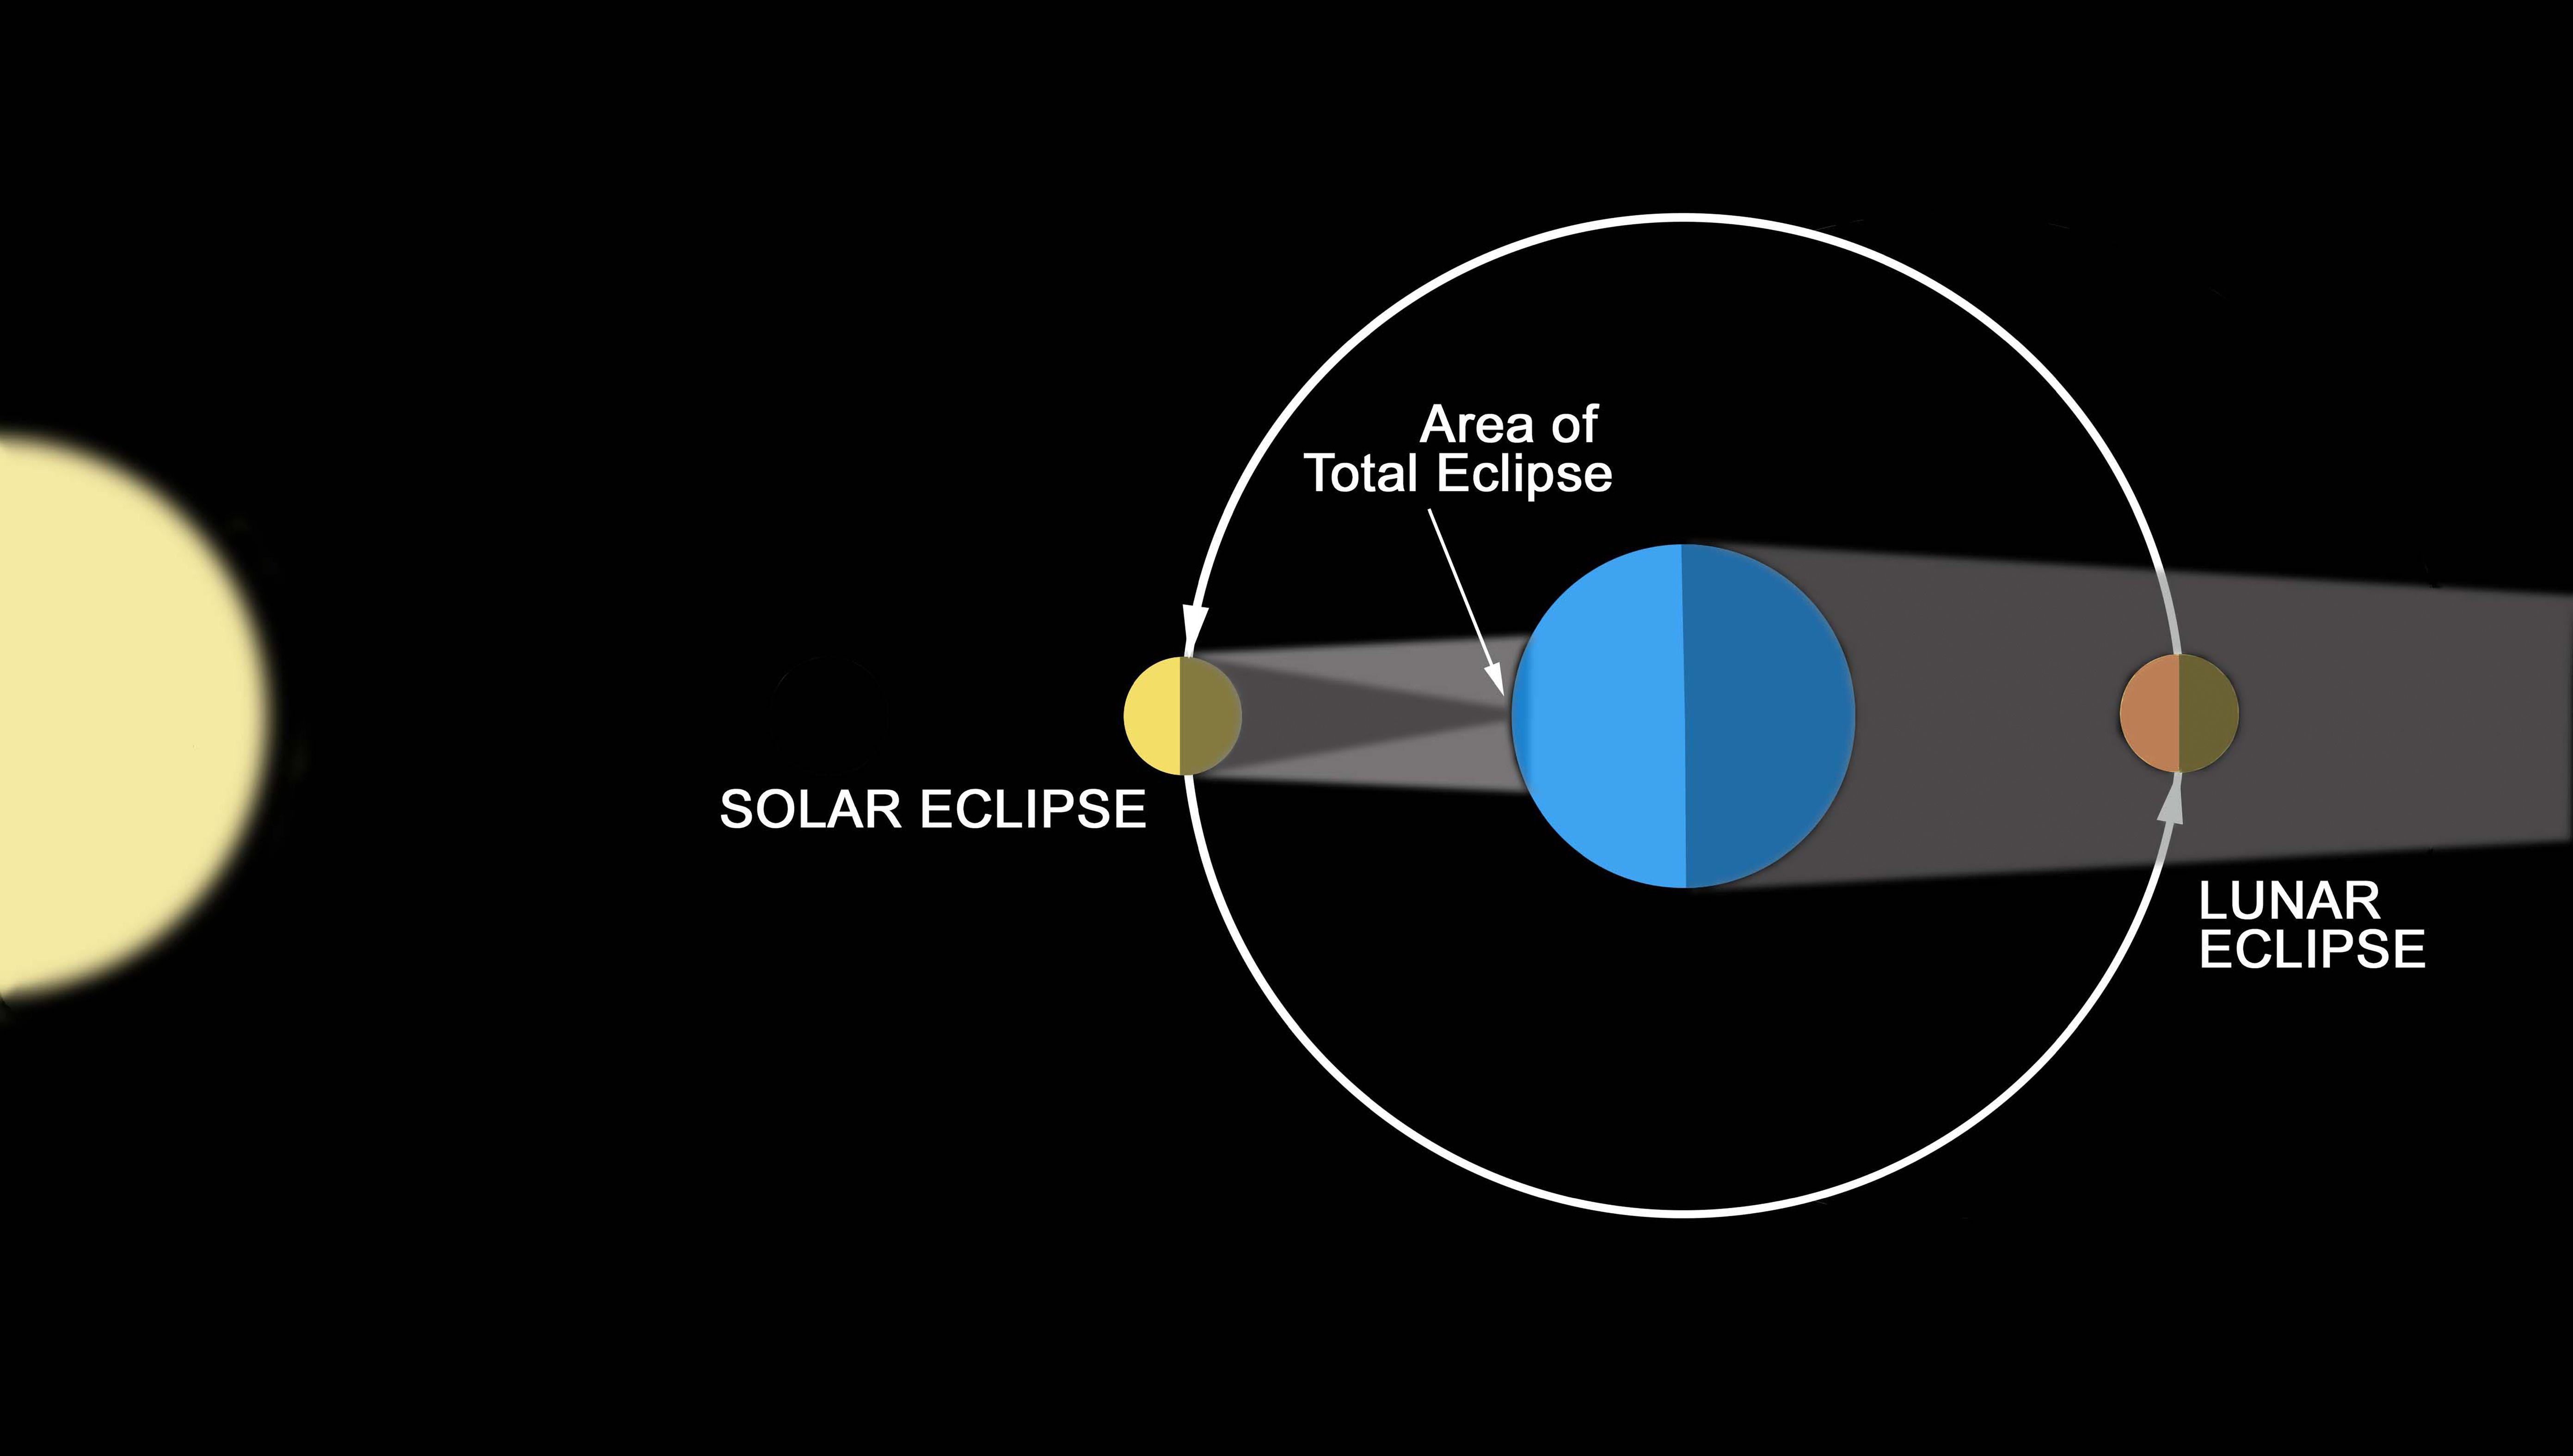 Lunar Eclipse Diagram Lunar Eclipse And The Blood Moon